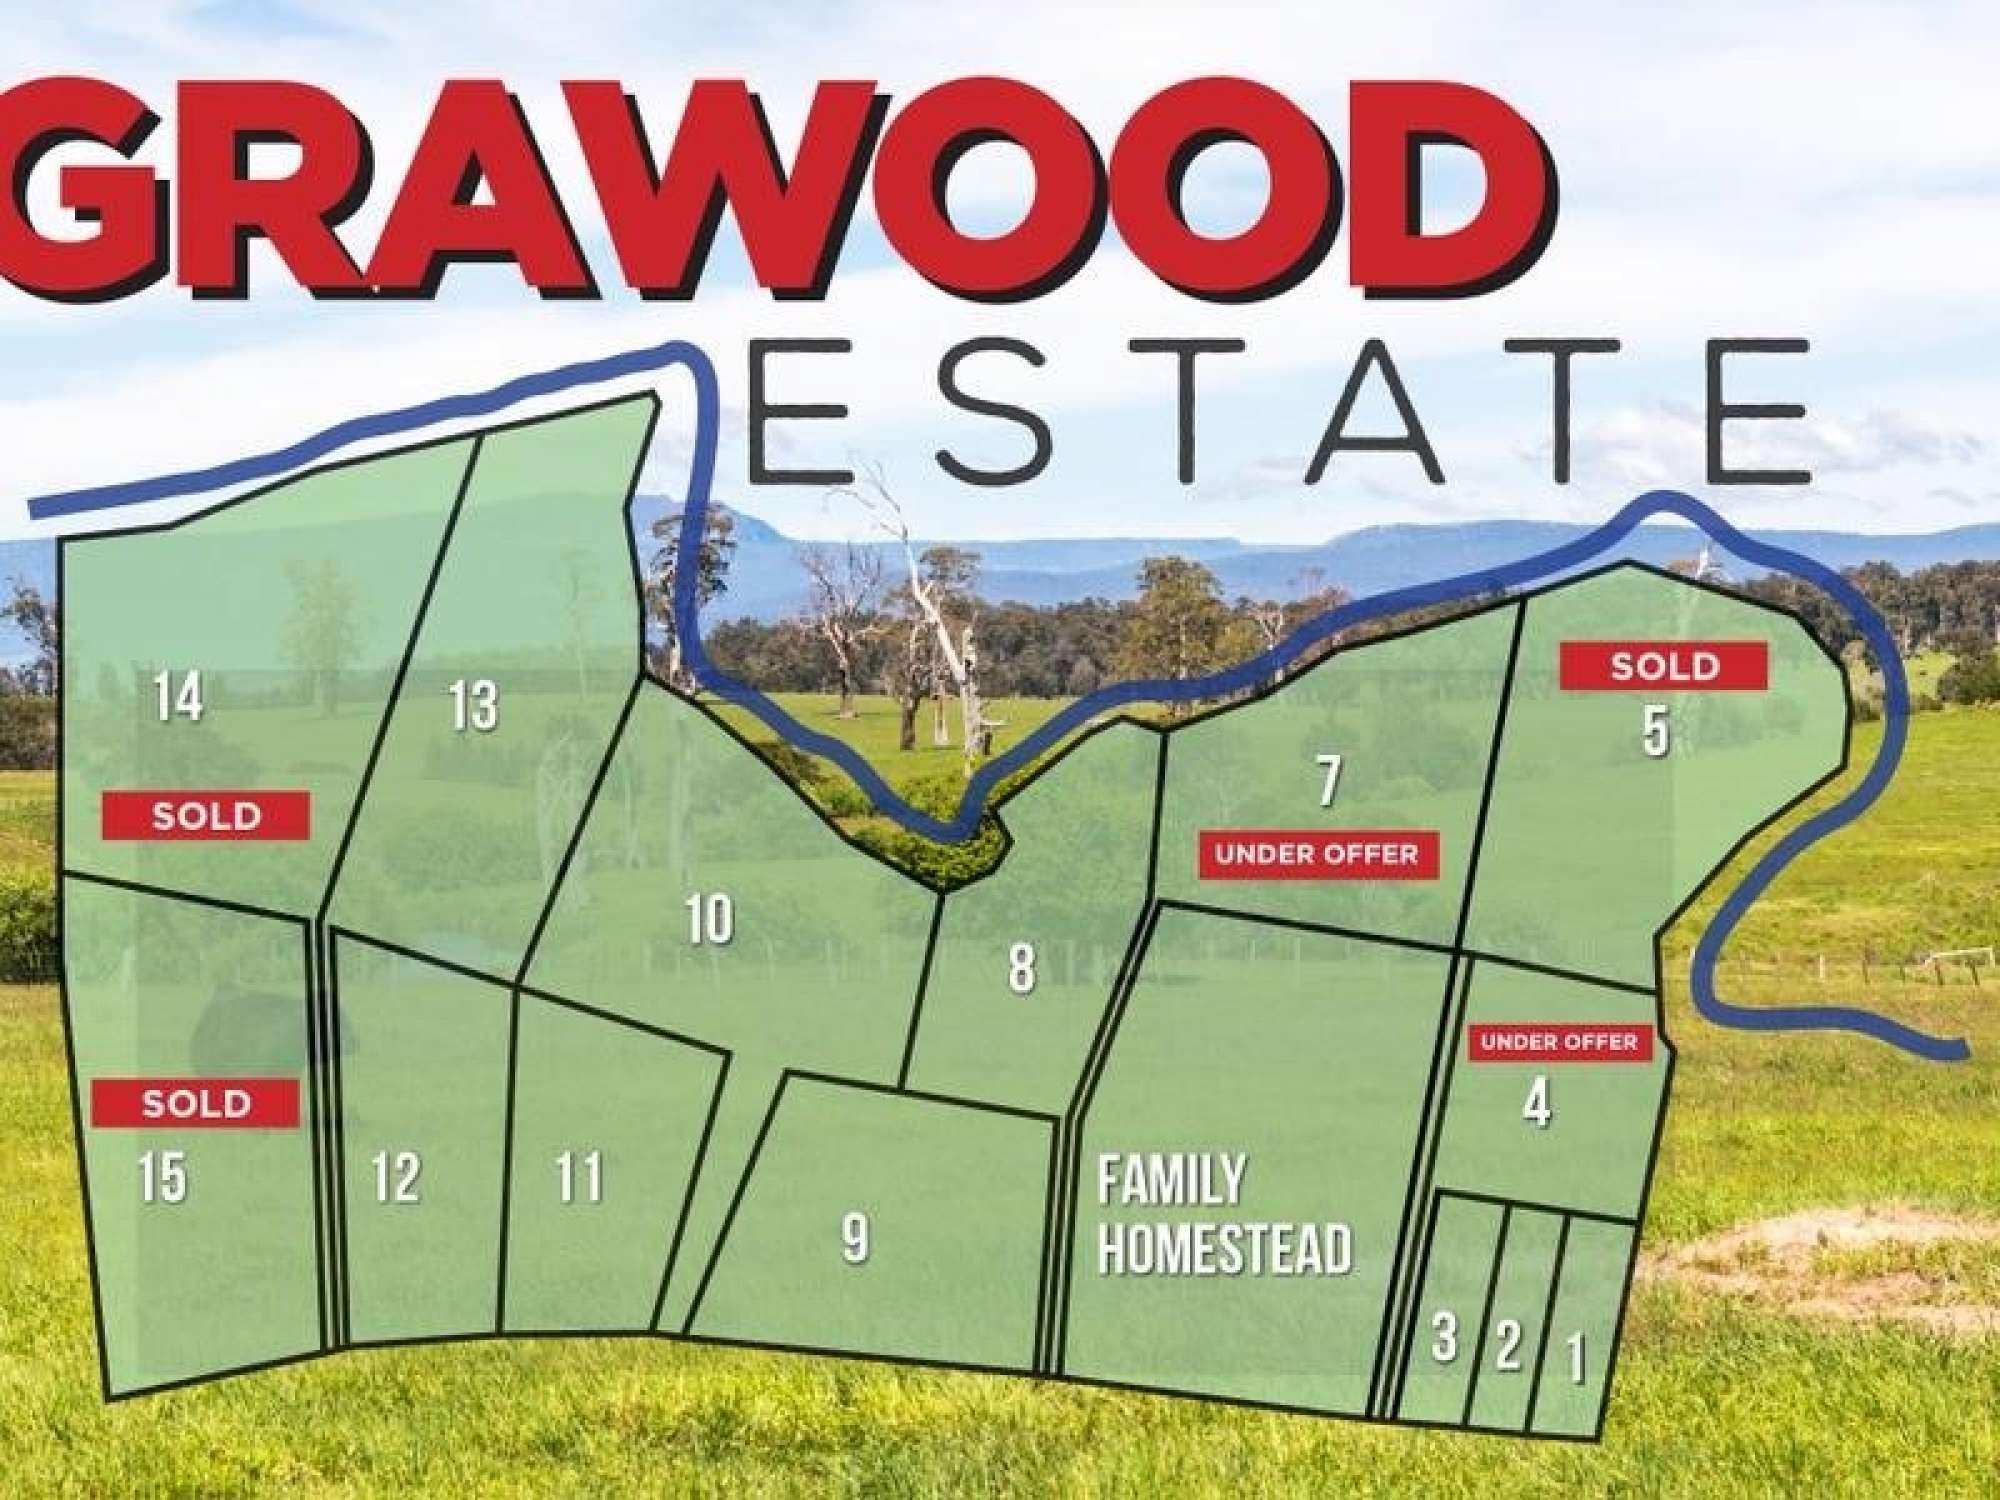 Grawood-Estate